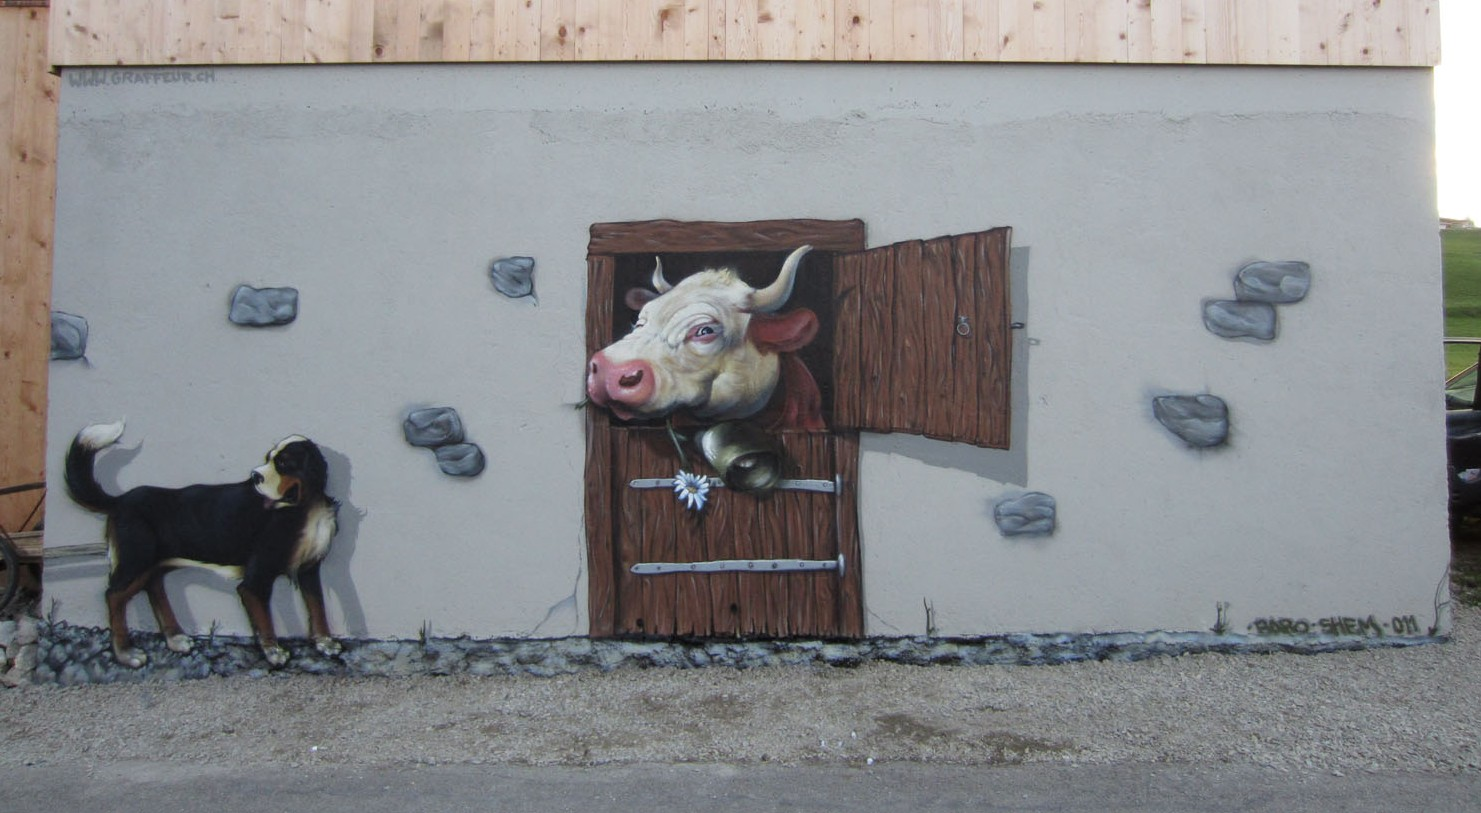 http://trompe-loeil.ch/wp-content/uploads/2011/10/mur2-e1318934147926.jpg